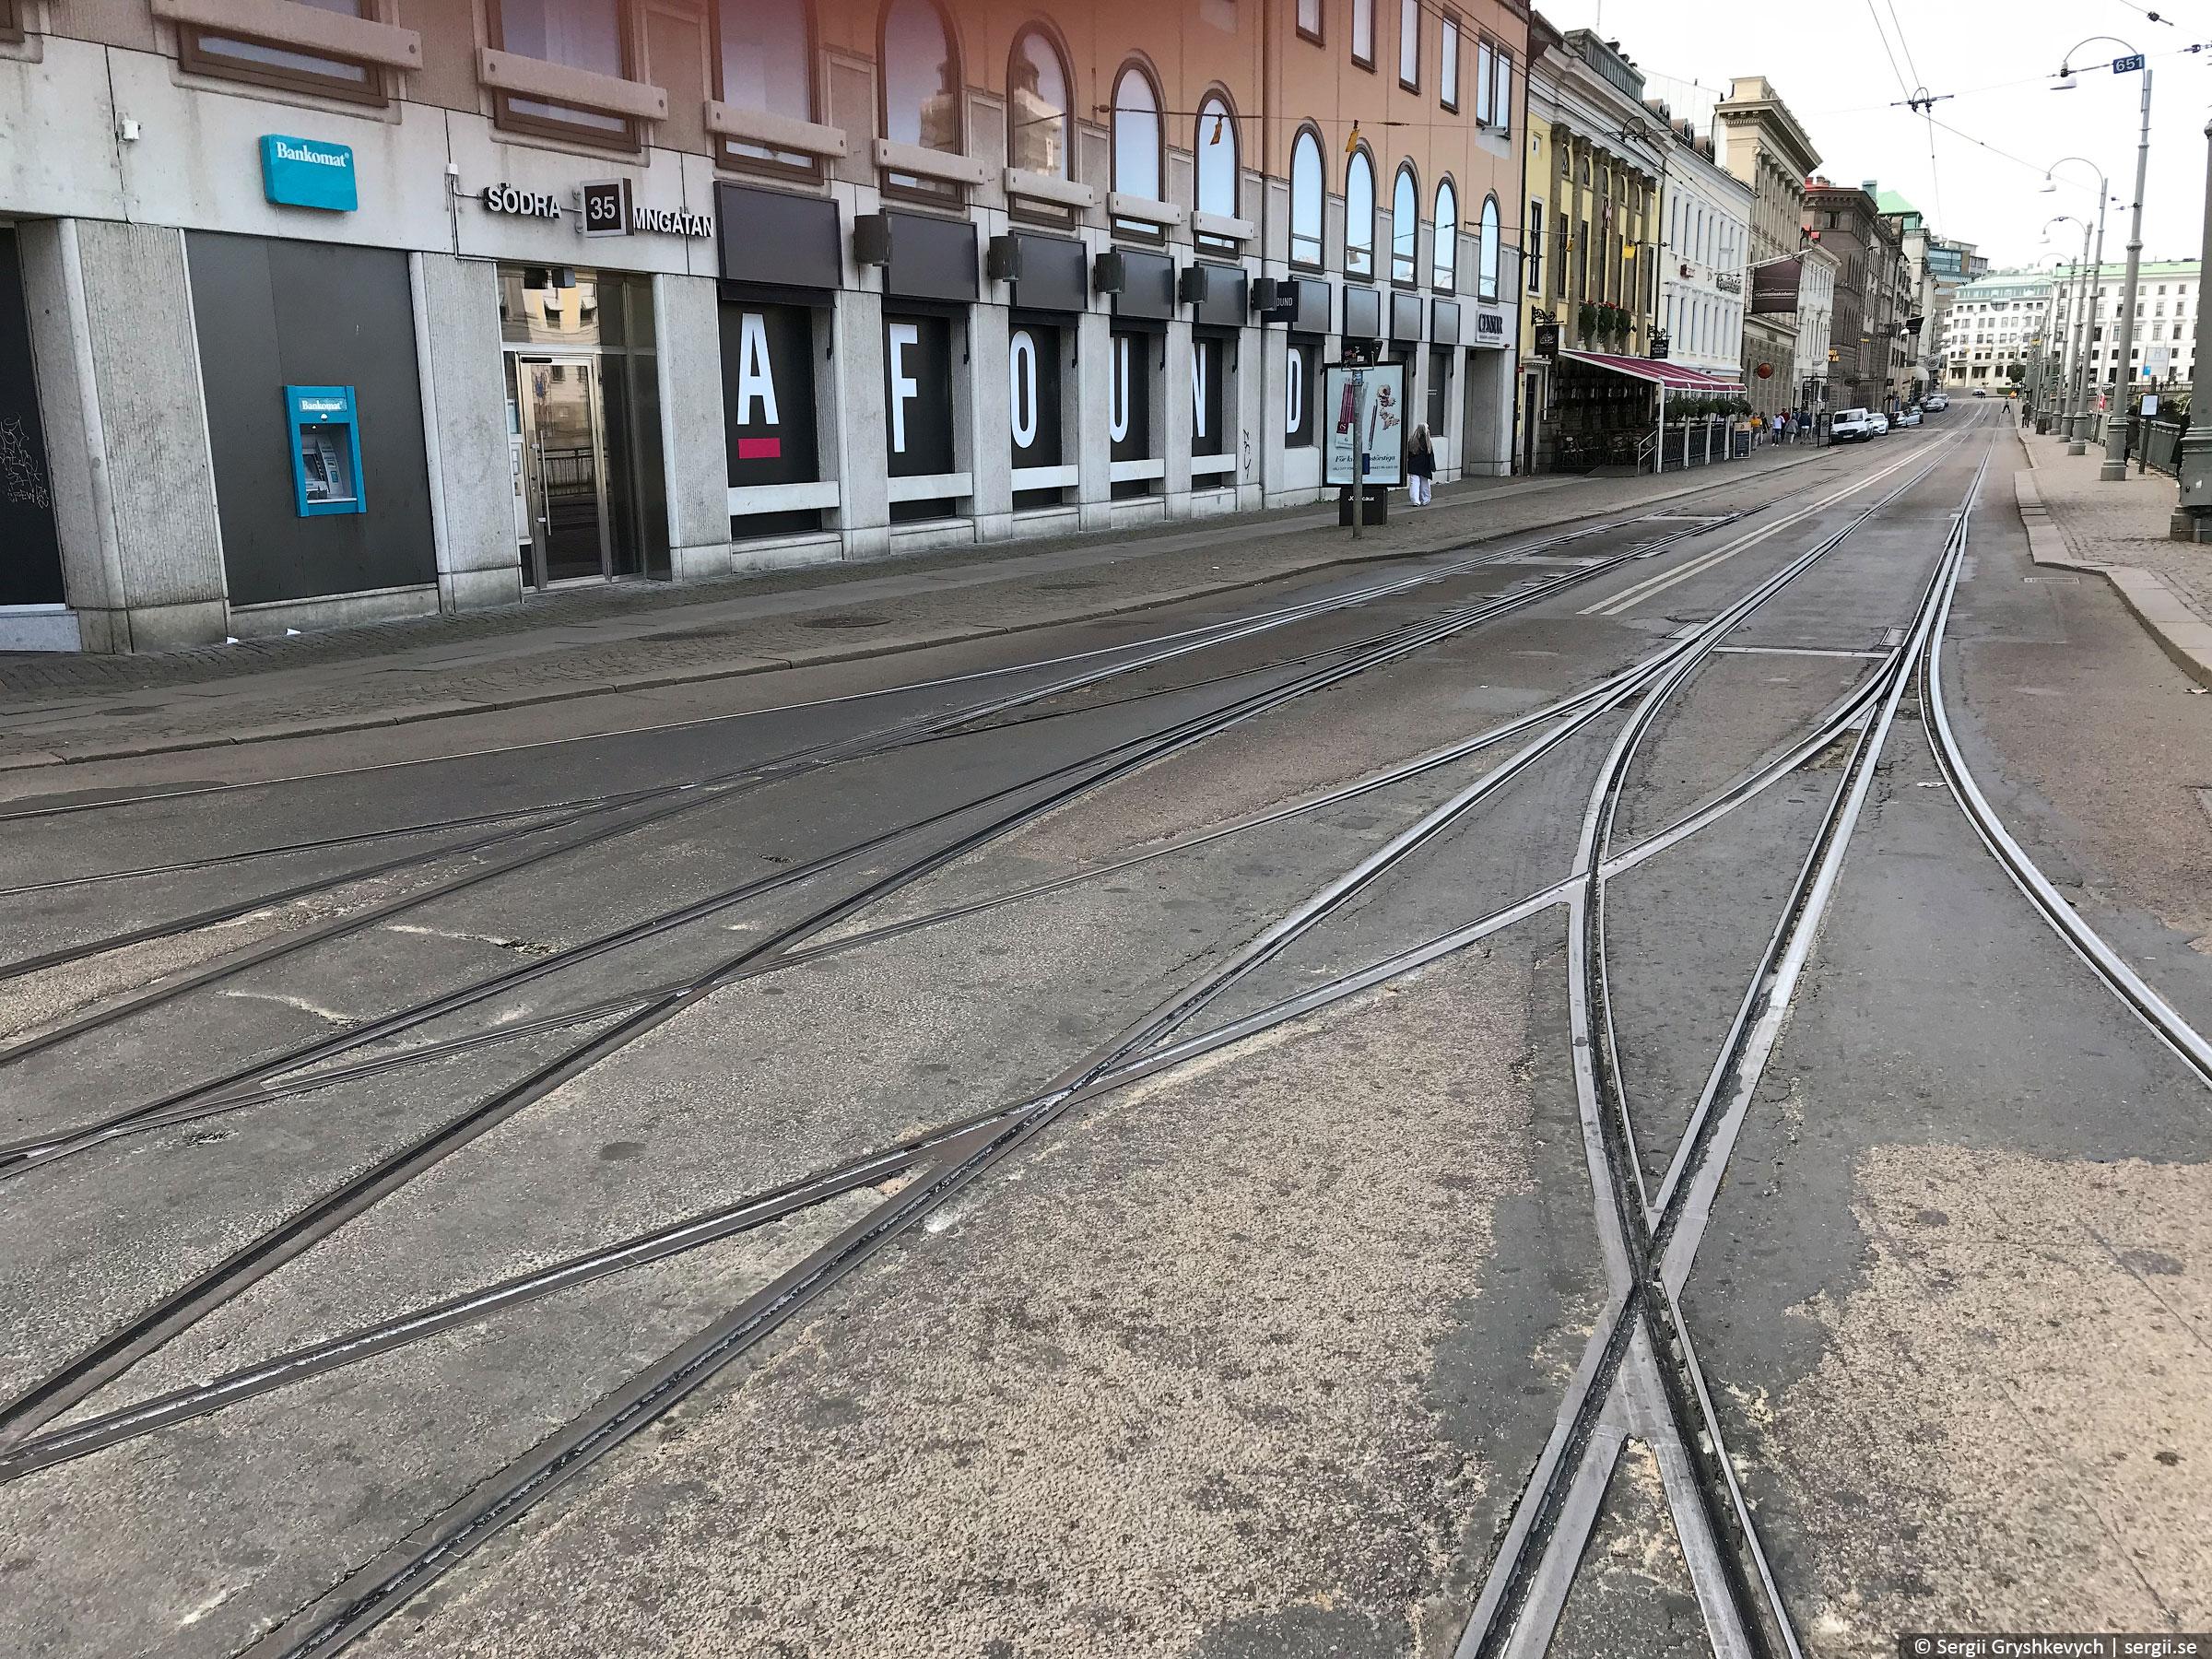 göteborg-ghotenburg-sweden-2018-19